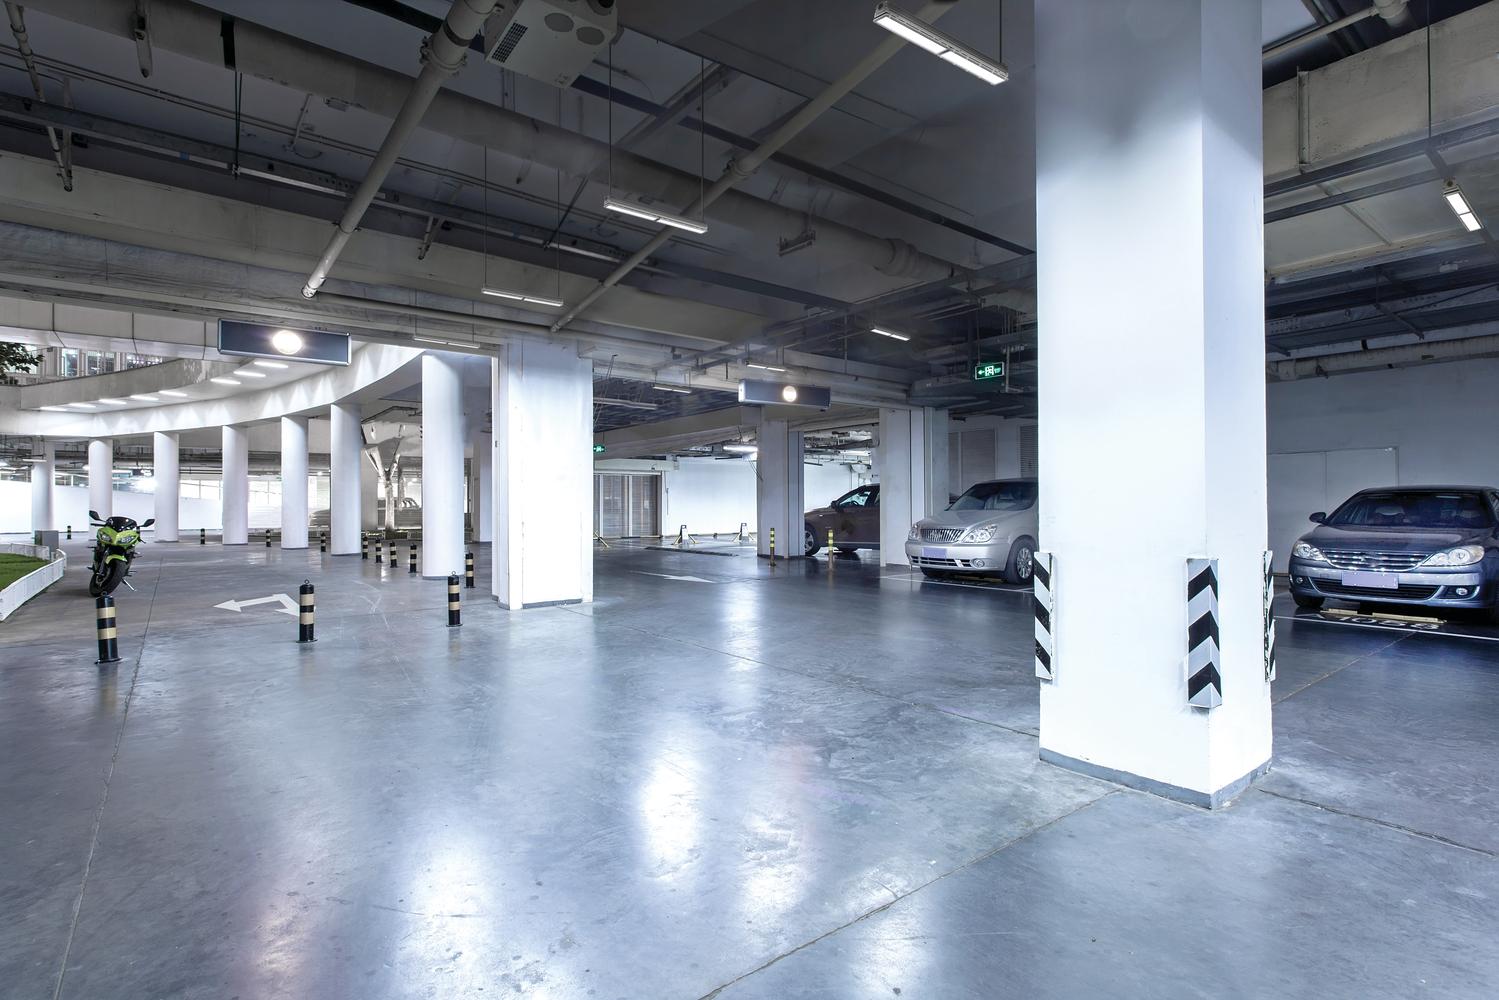 FEX L48_Parking Garage.jpeg